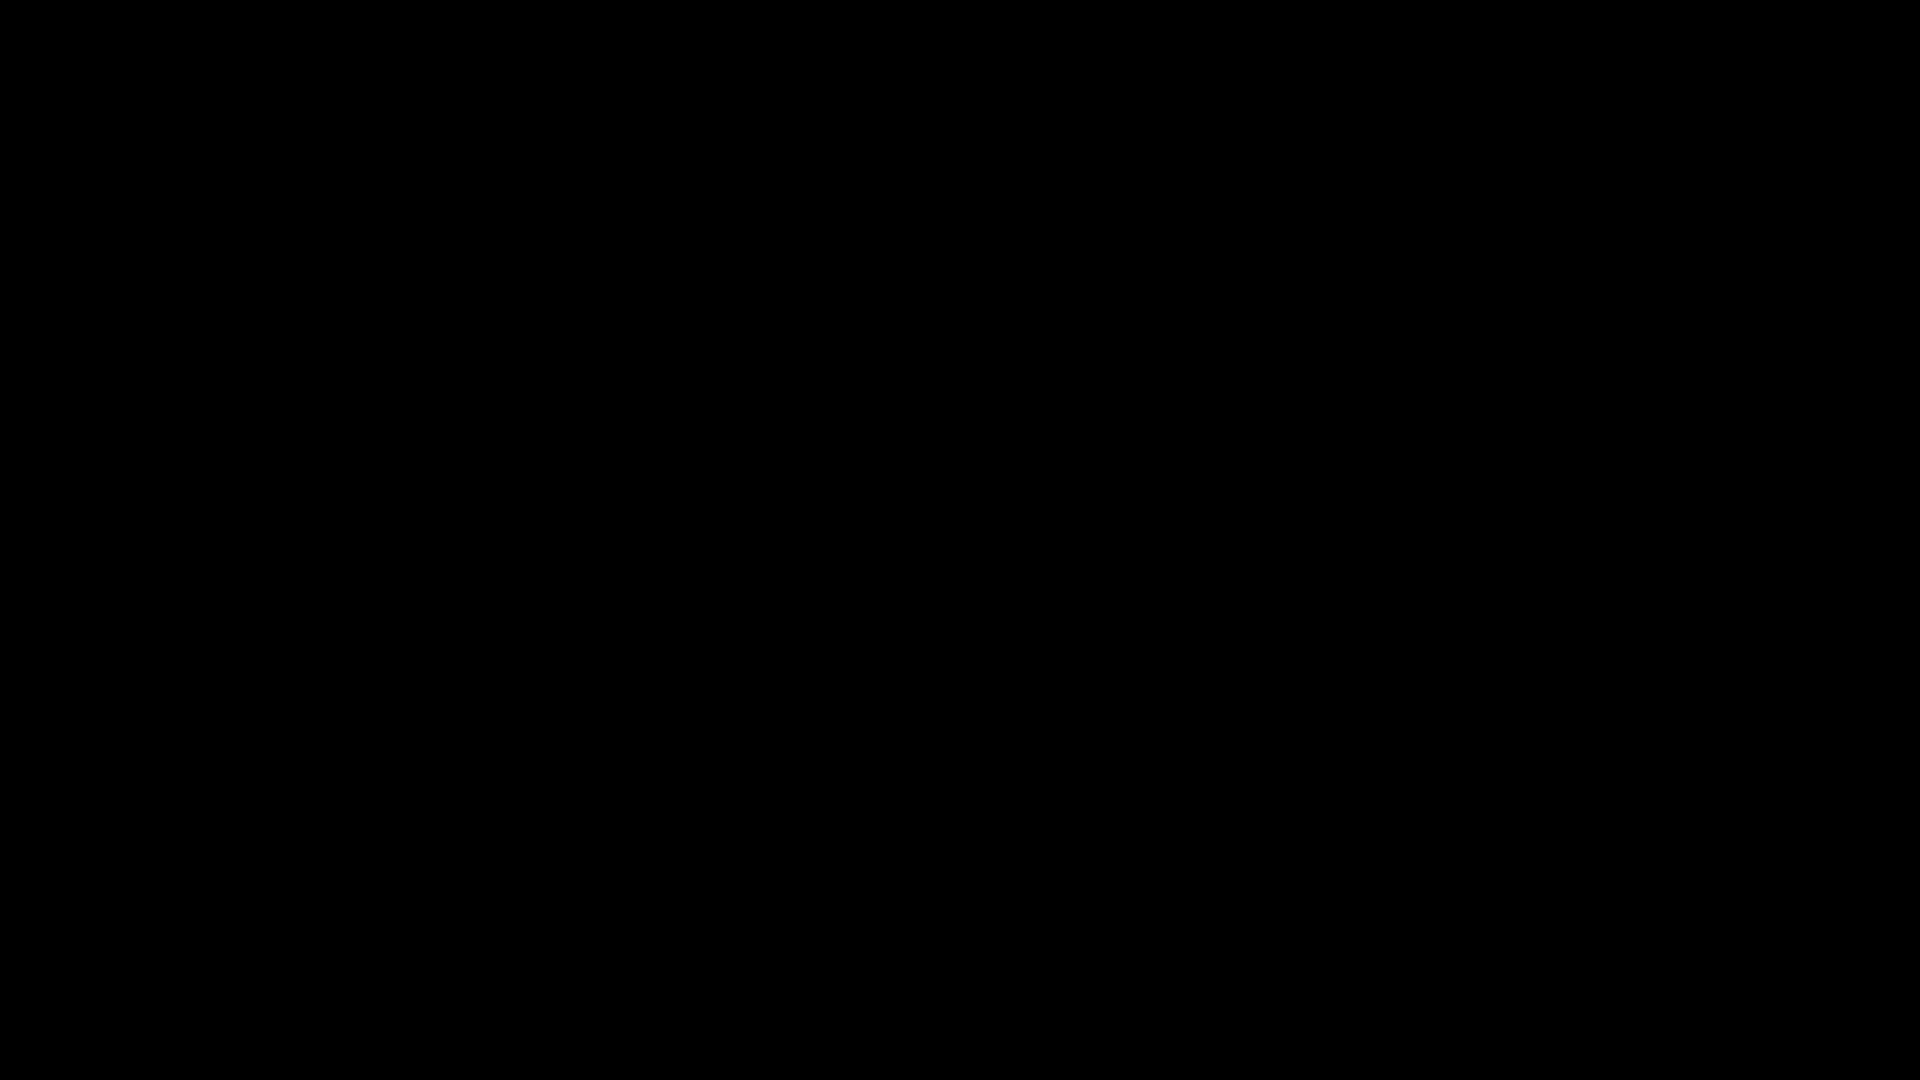 Setting a Plain Black Wallpaper on iOS